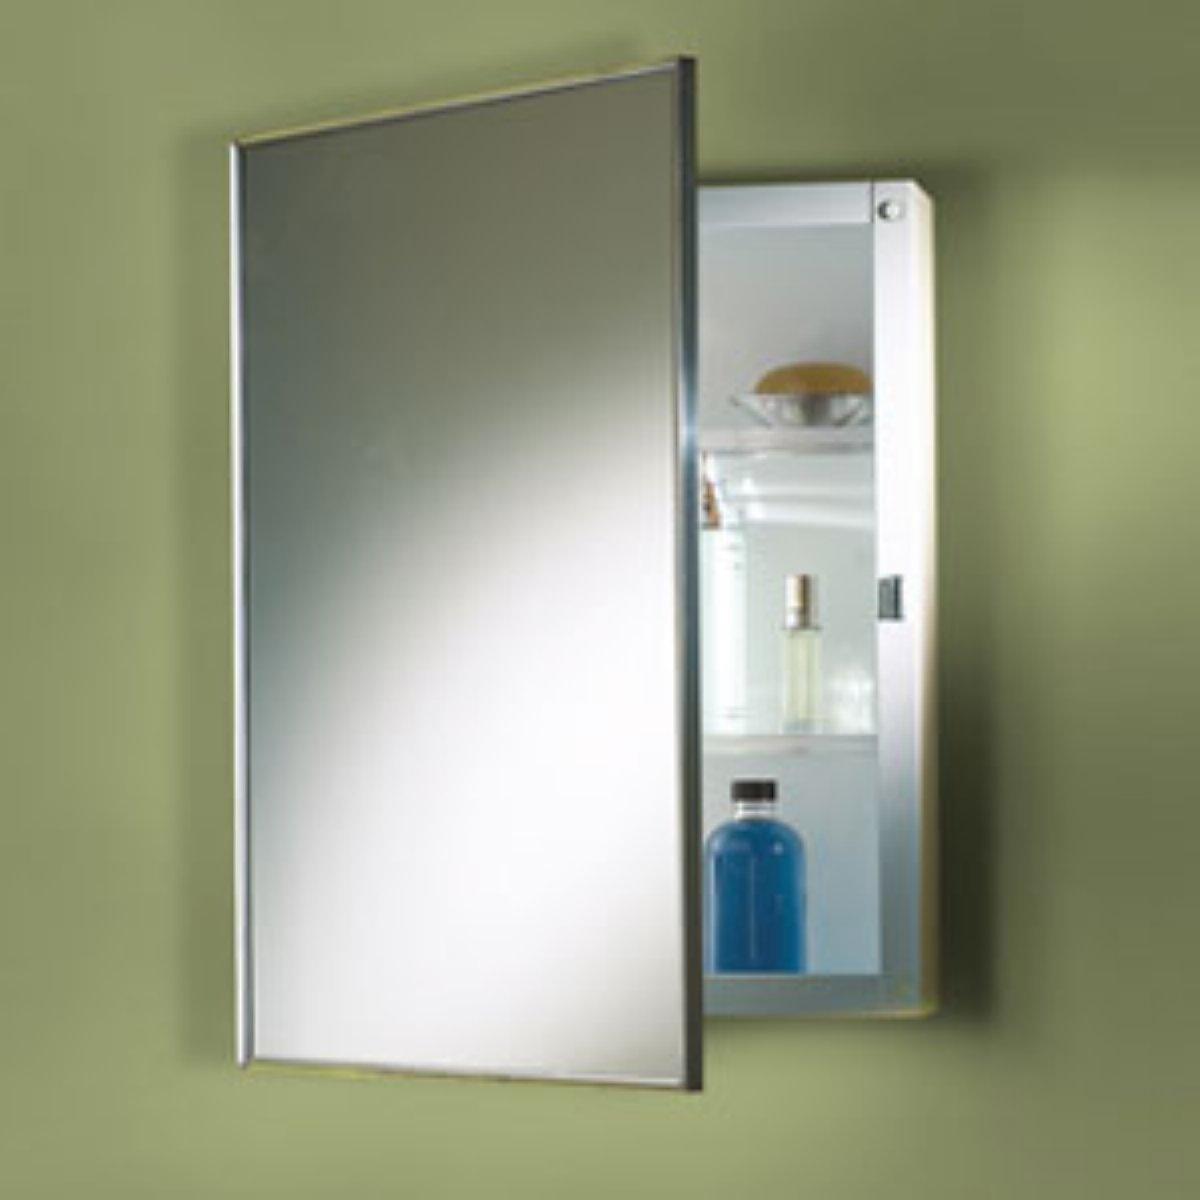 Mirror Bathroom Wall Cabinetbest mirrored bathroom cabinet design optimizing home decor ideas